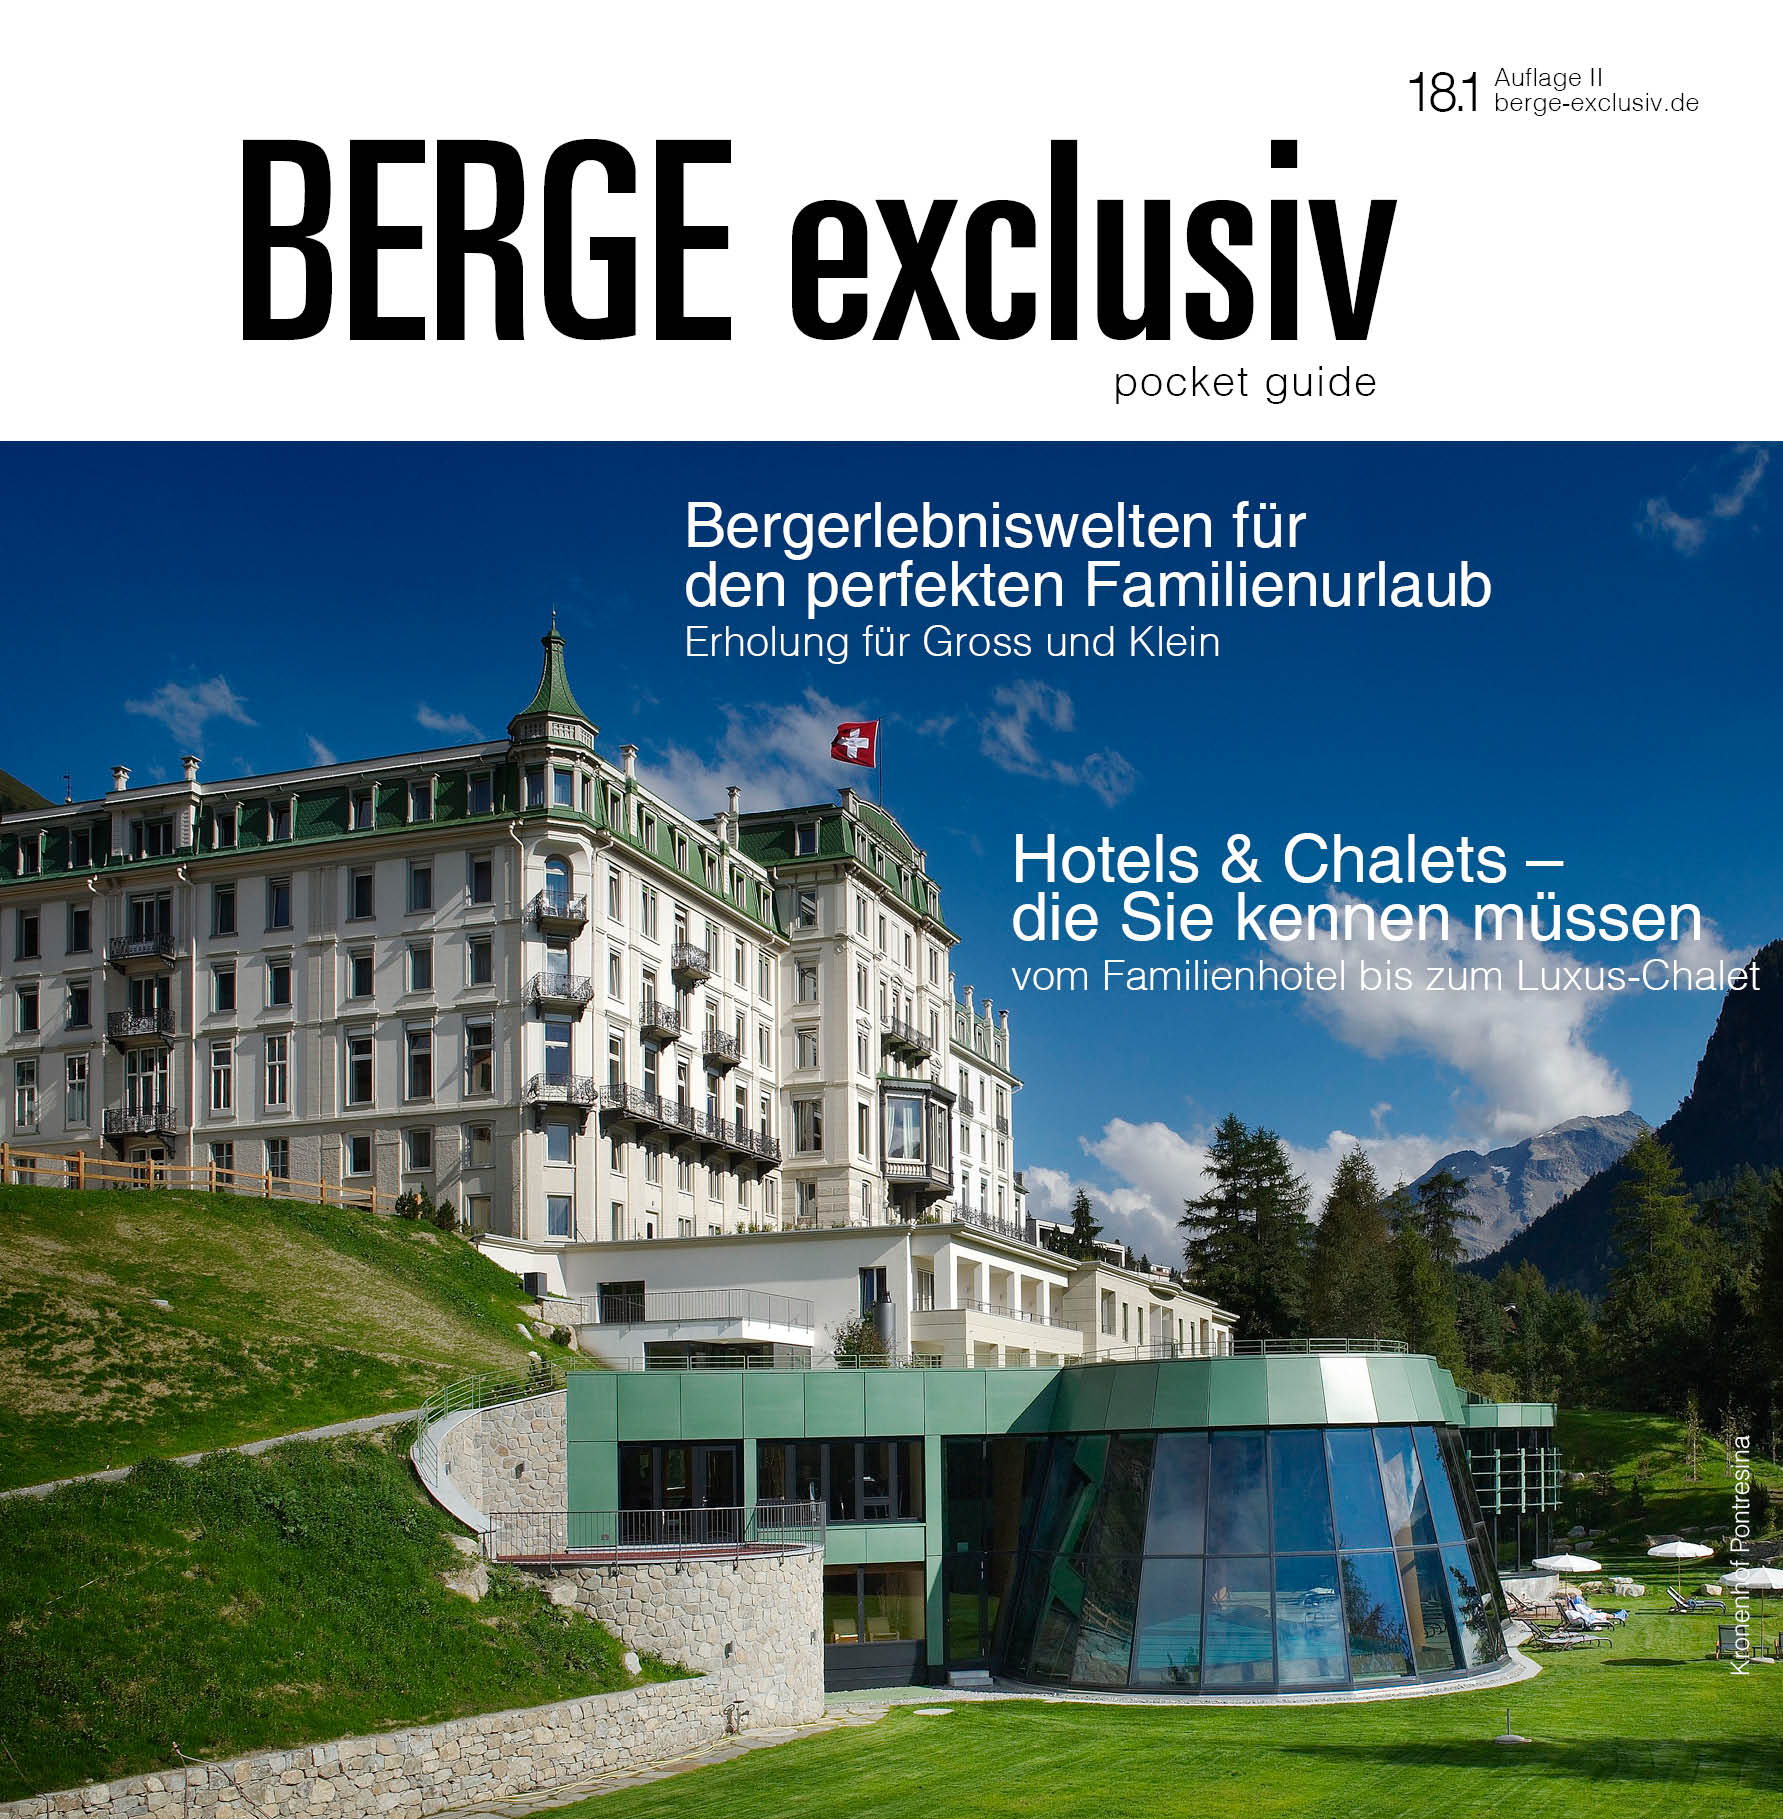 http://www.berge-exclusiv.de/wp-content/uploads/Pocket-Guide-180416.jpg